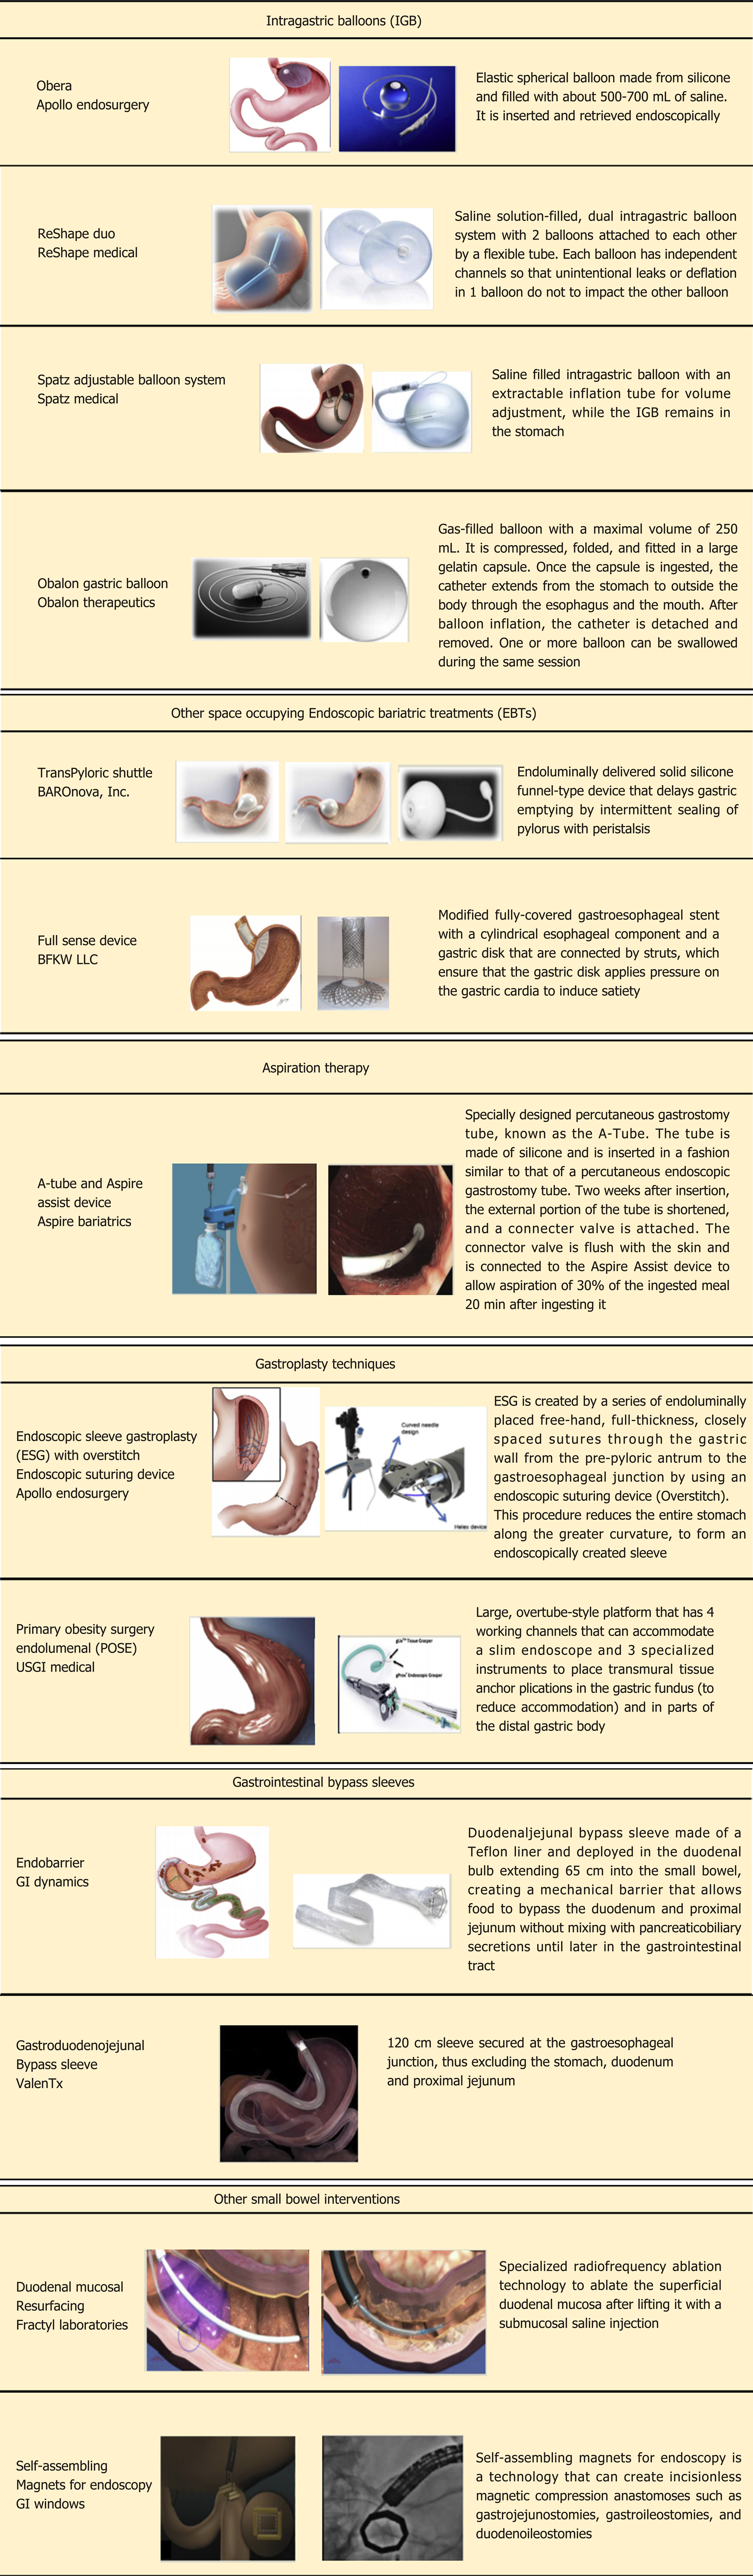 New Era: Endoscopic treatment options in obesity–a paradigm